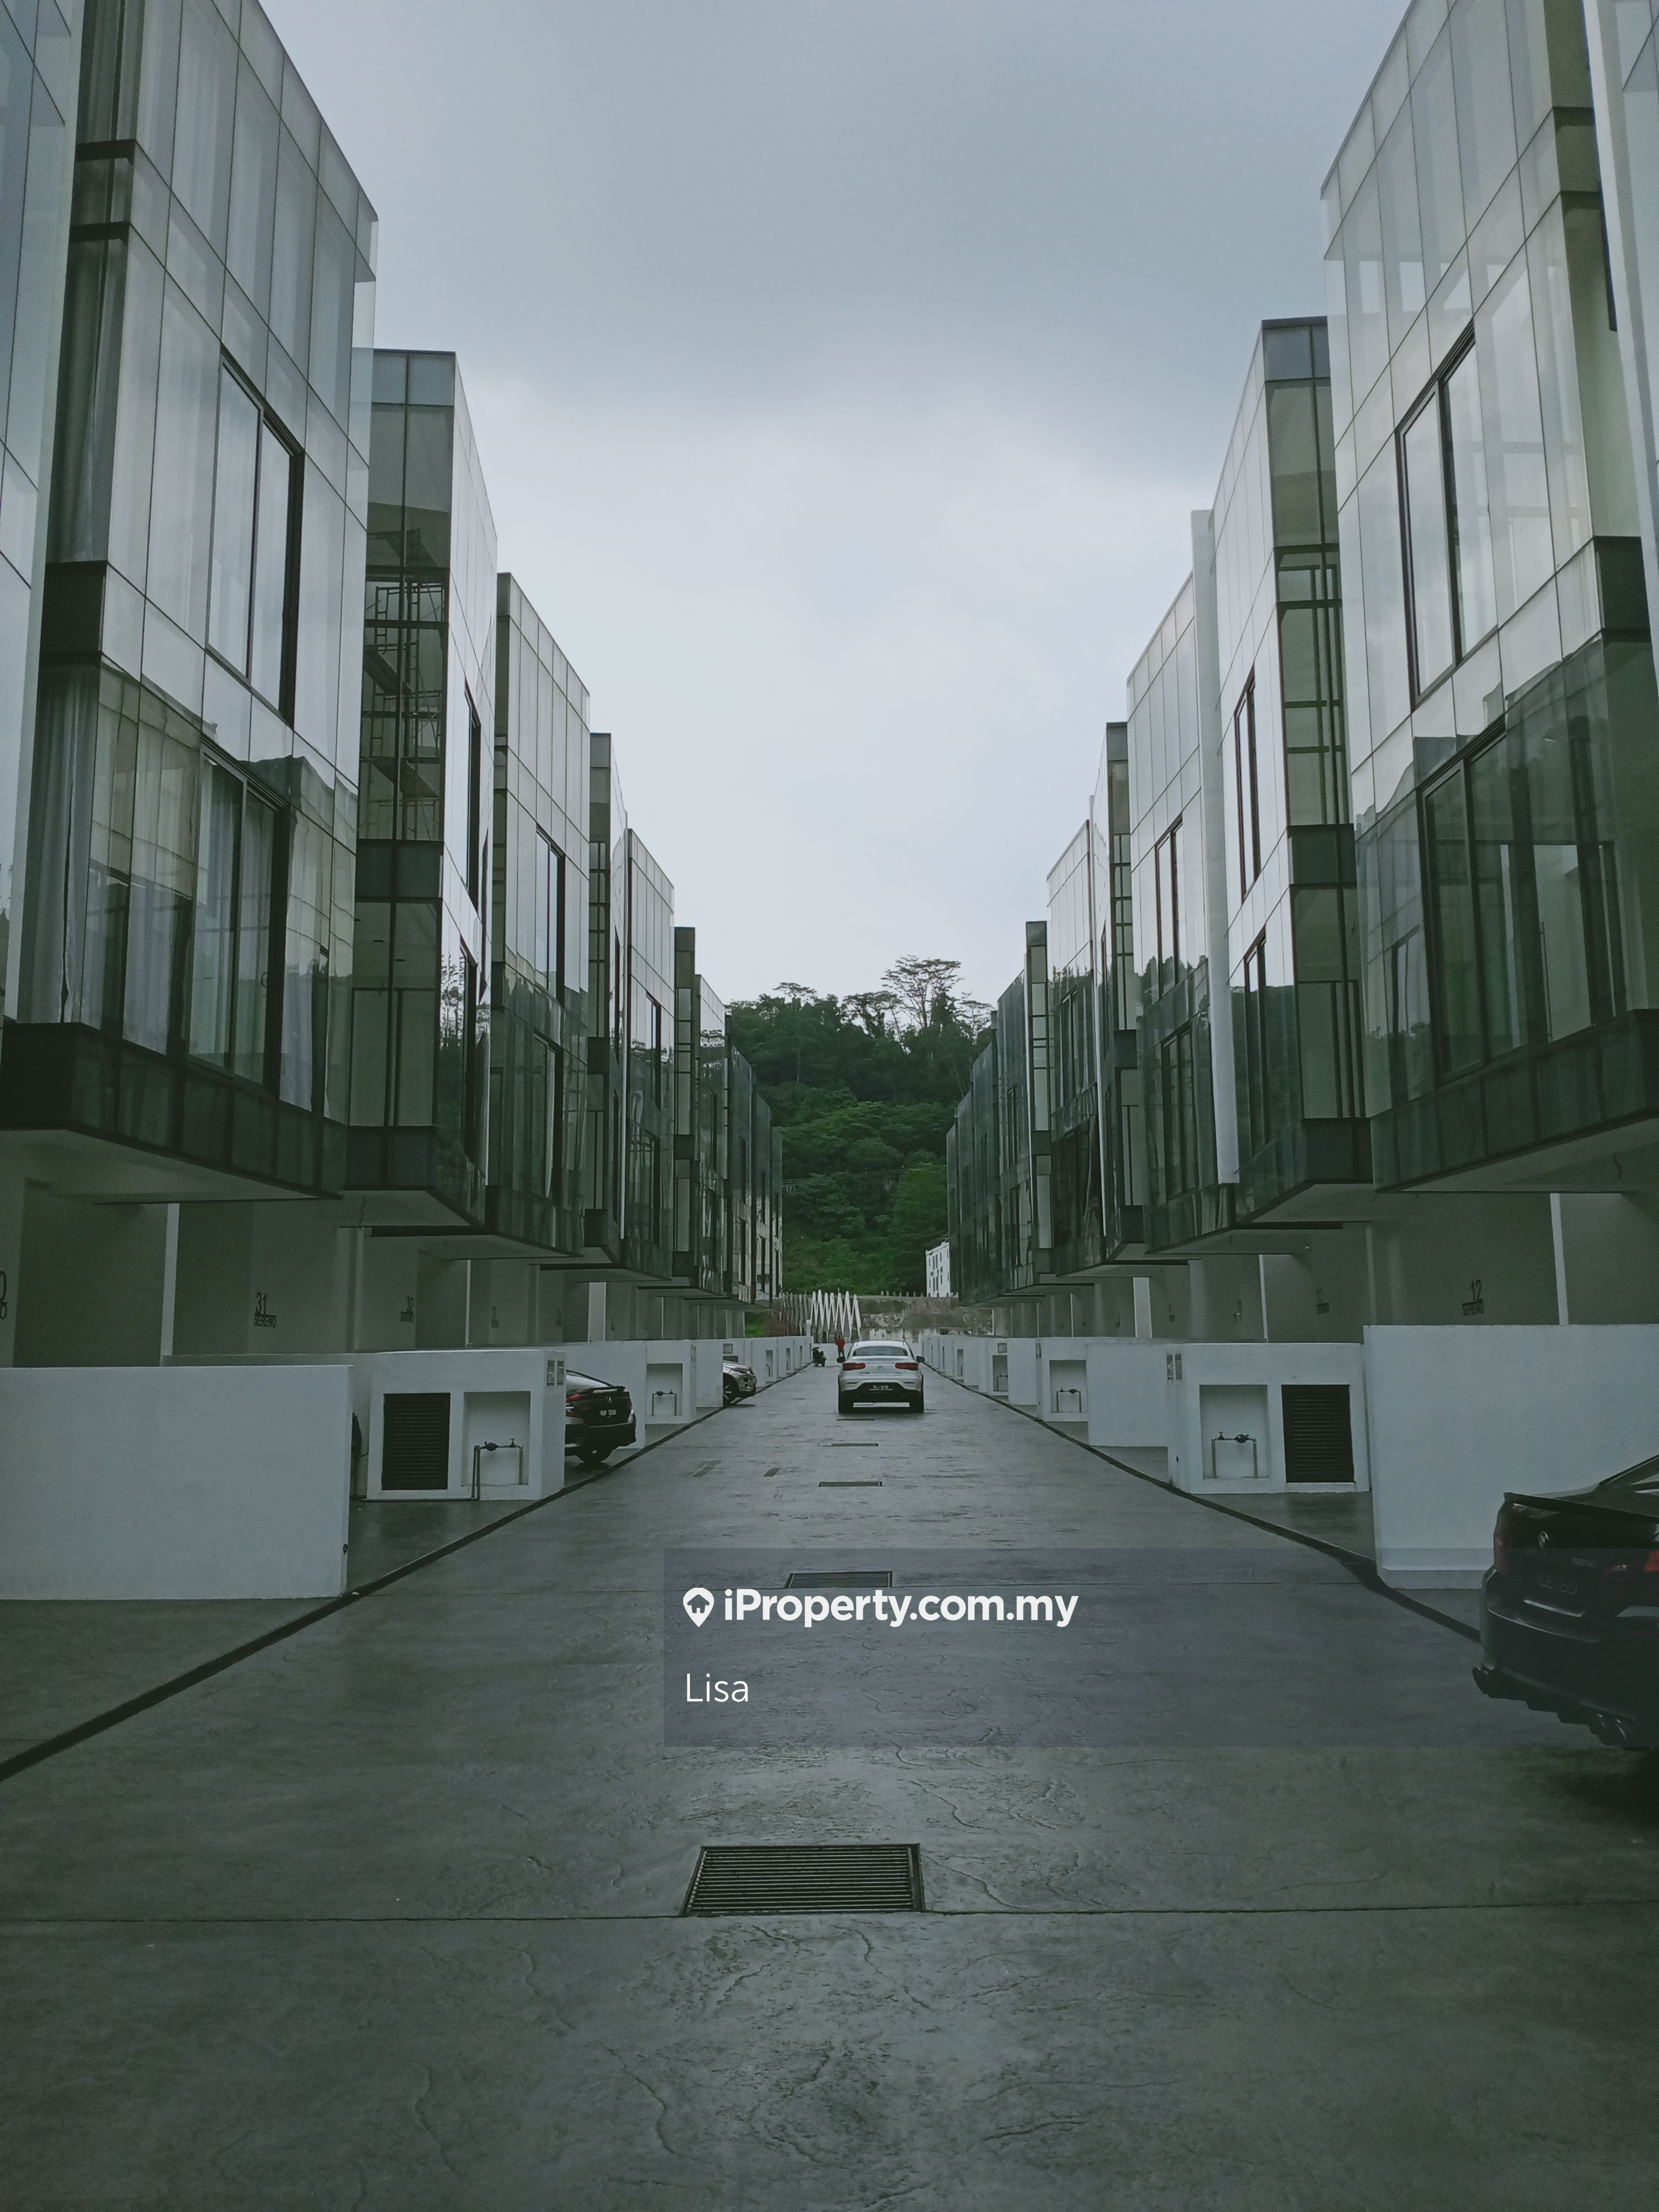 Empire Residence SERENO, Damansara Perdana